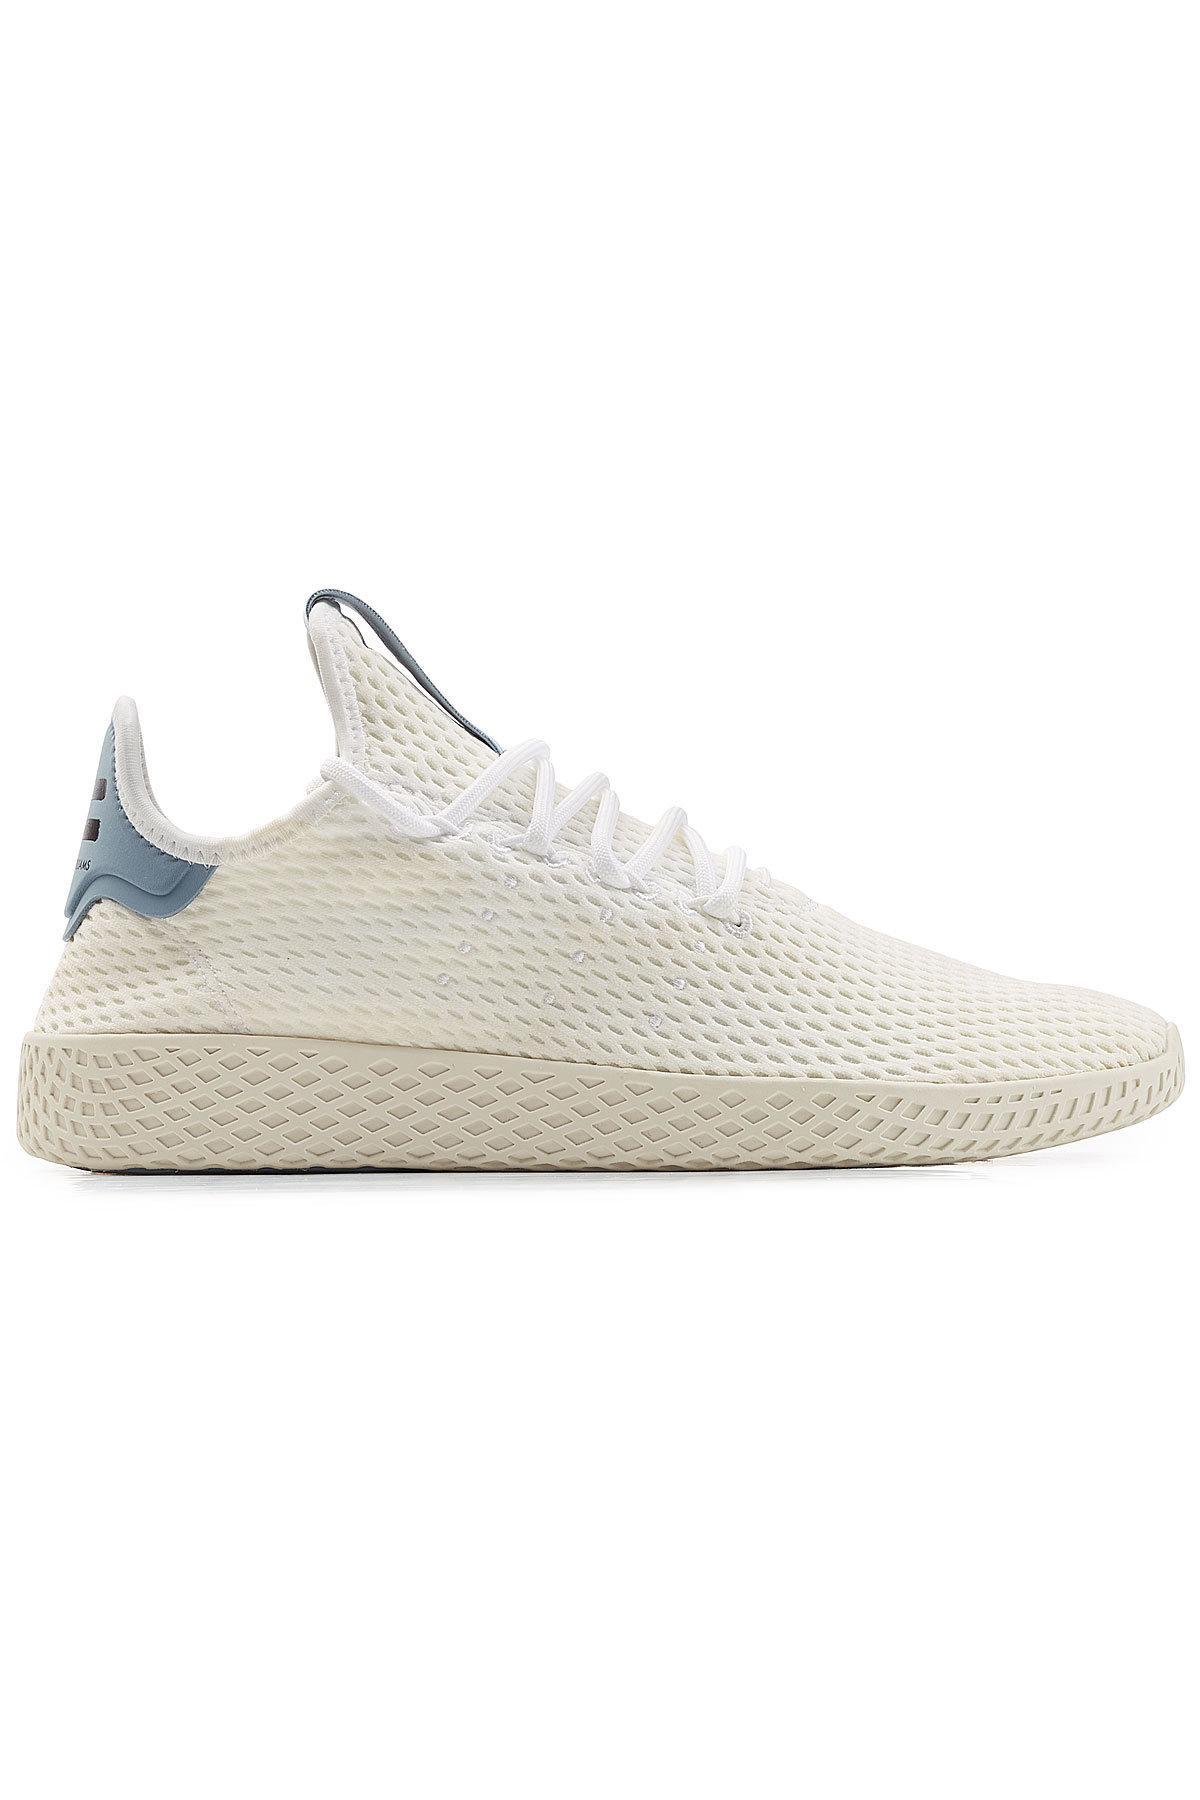 a825f51d109 Adidas Originals - White Pharrell Williams Tennis Hu Sneakers for Men -  Lyst. View fullscreen